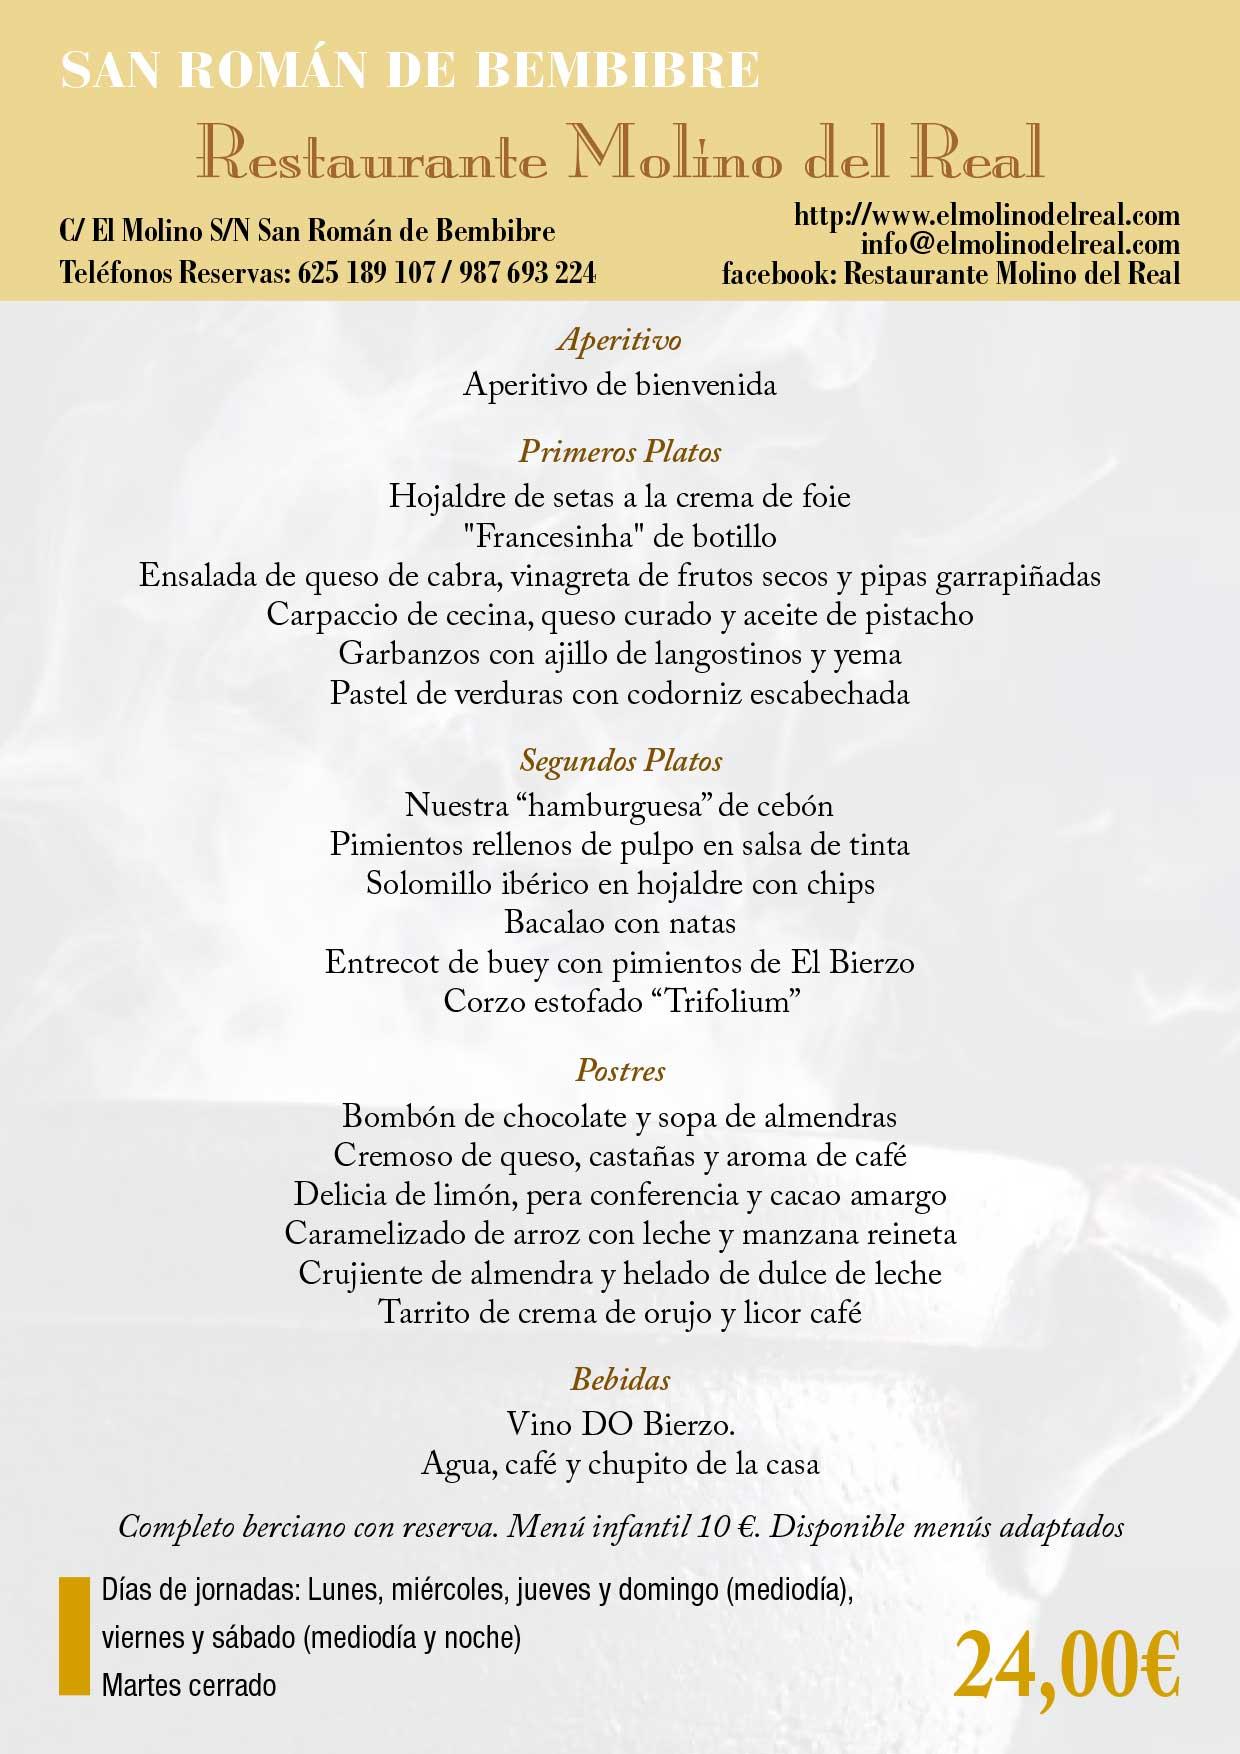 XXXIII Jornadas gastronómicas del Bierzo 2017. Restaurantes participantes 15